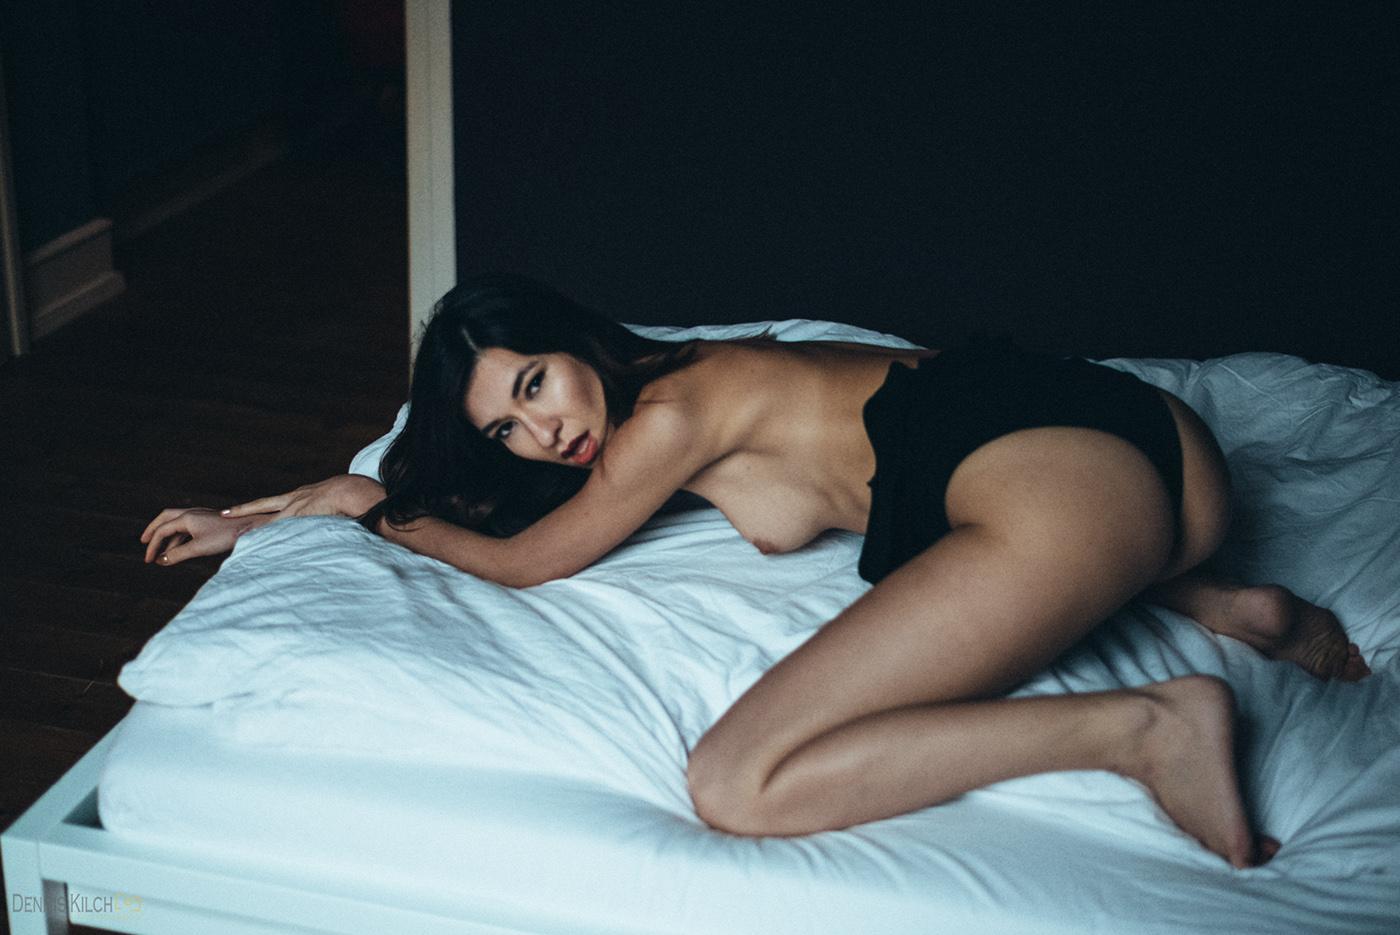 Постель и балкон - Bed & Balcony / denniskilchphotography +